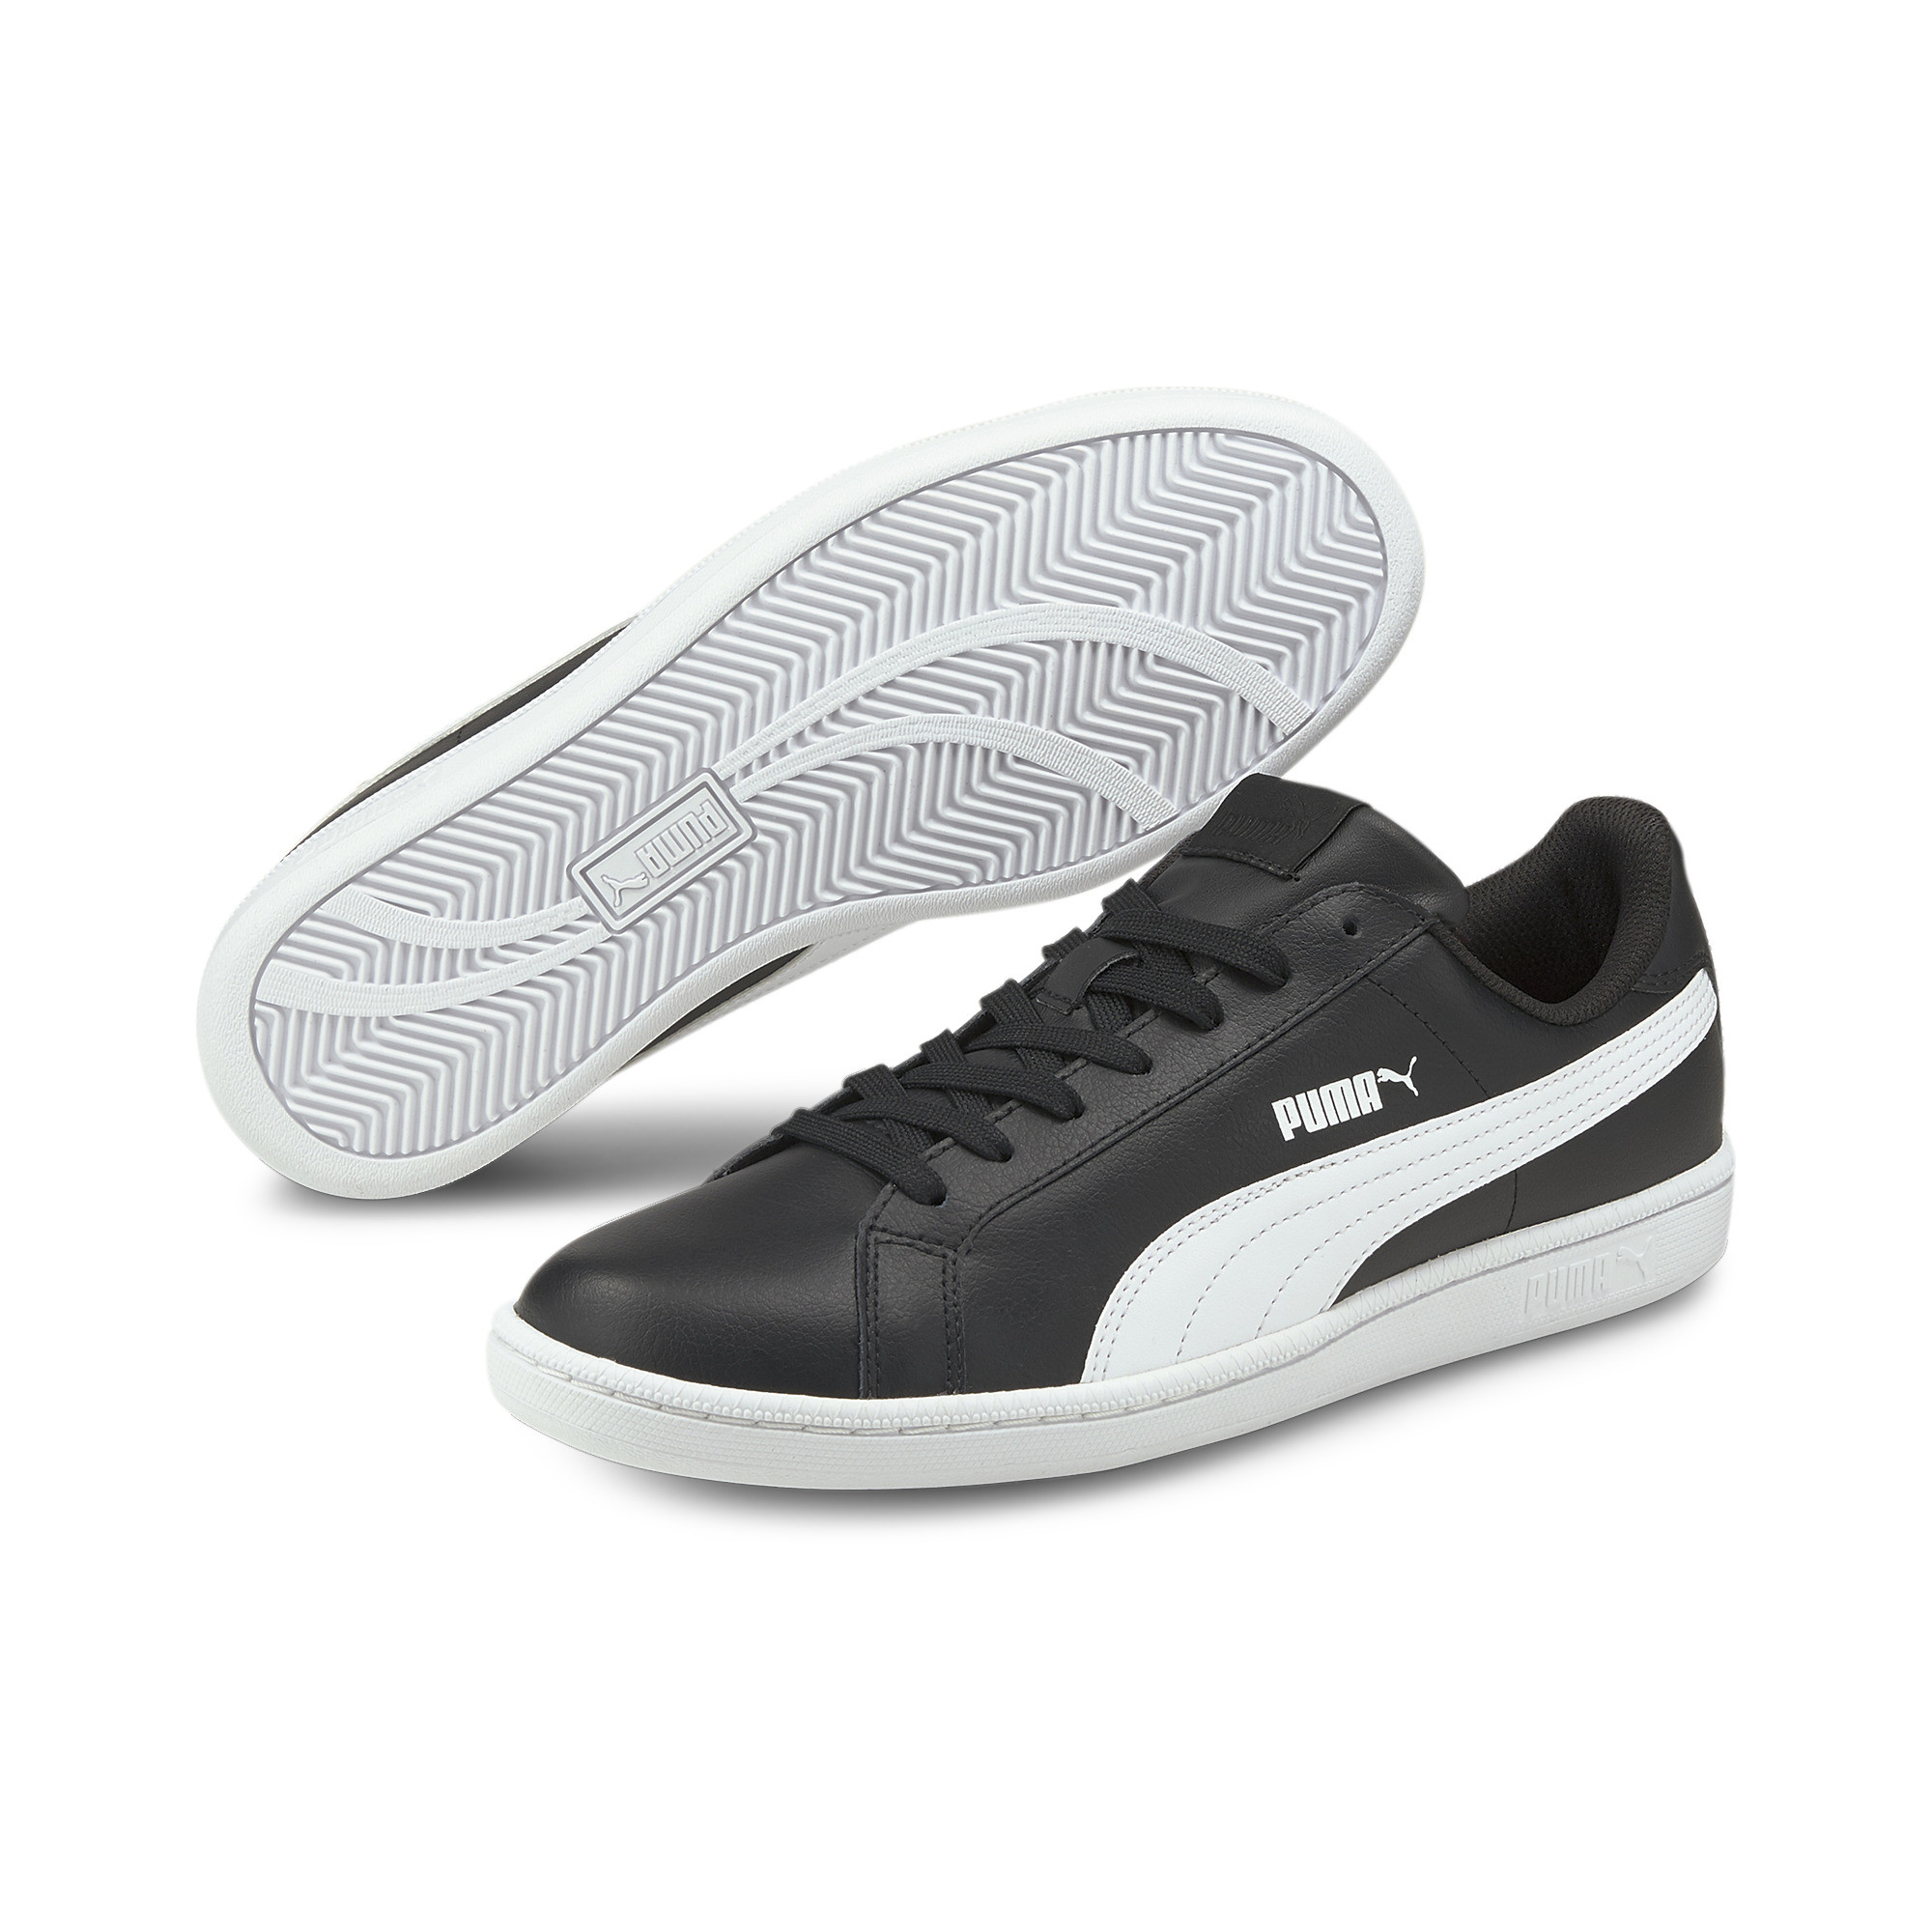 Indexbild 22 - PUMA Smash Trainers Schuhe Sneakers Sport Classics Unisex Neu